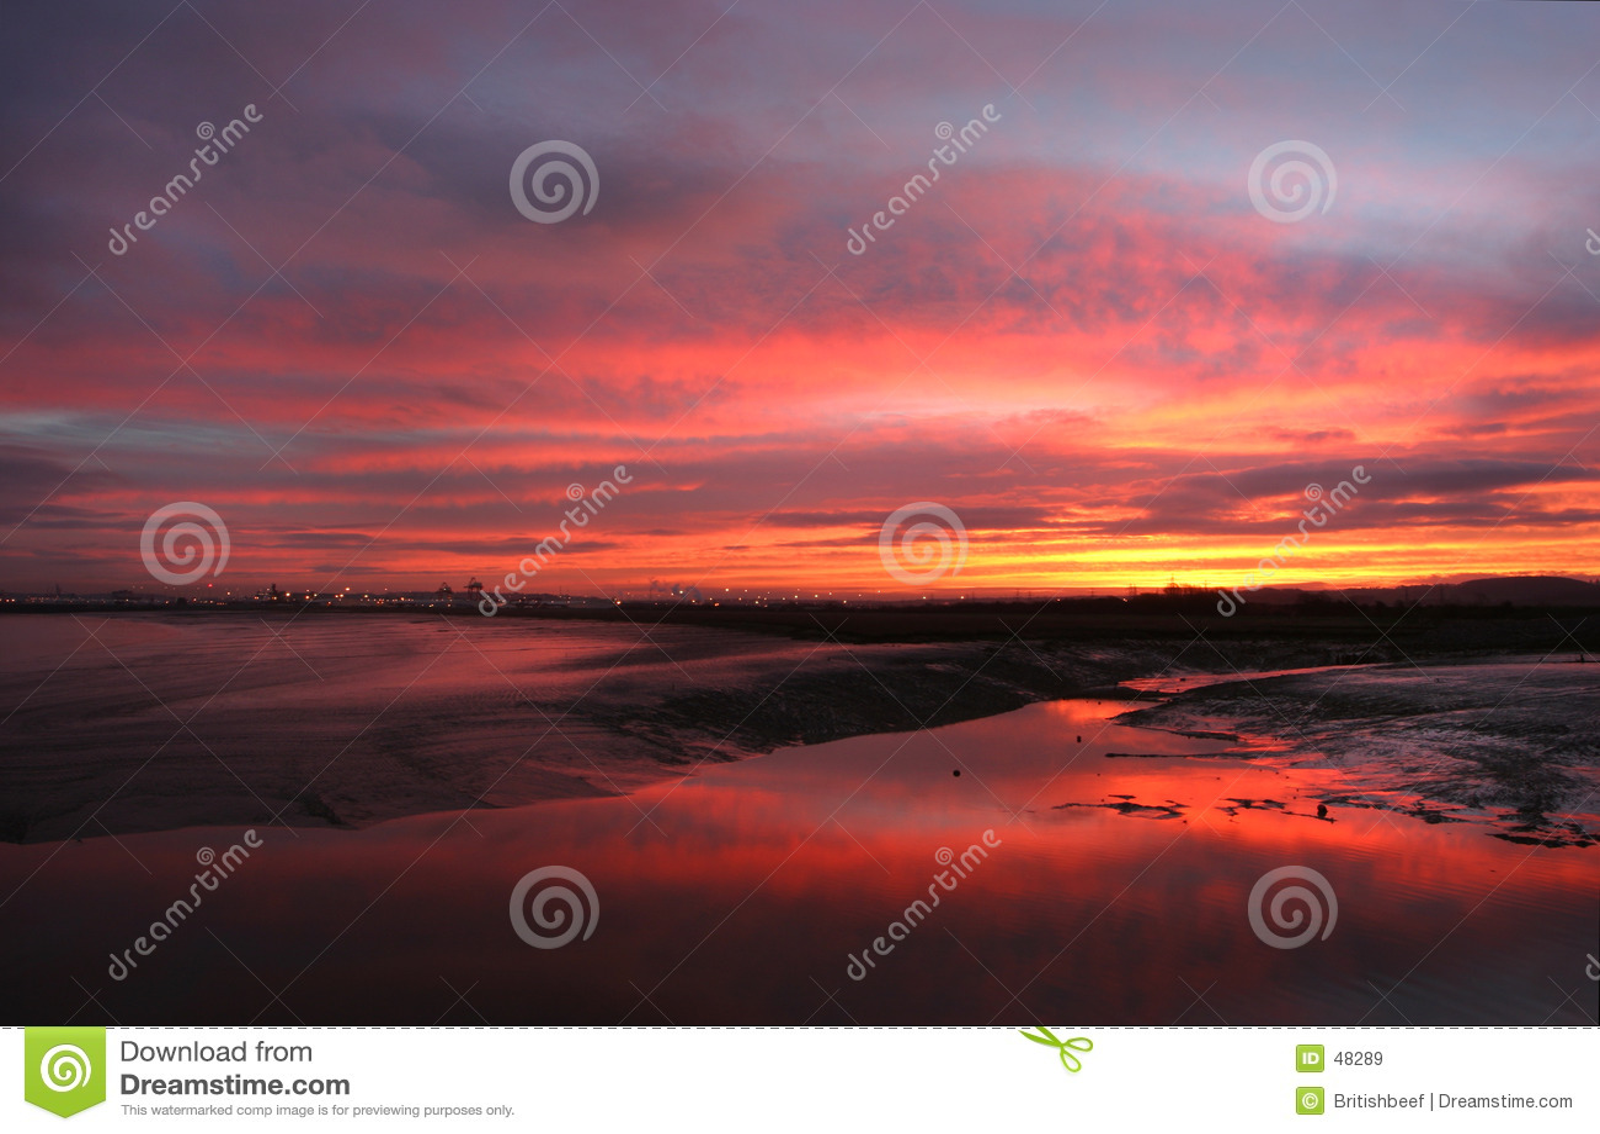 Sunrise over estuary